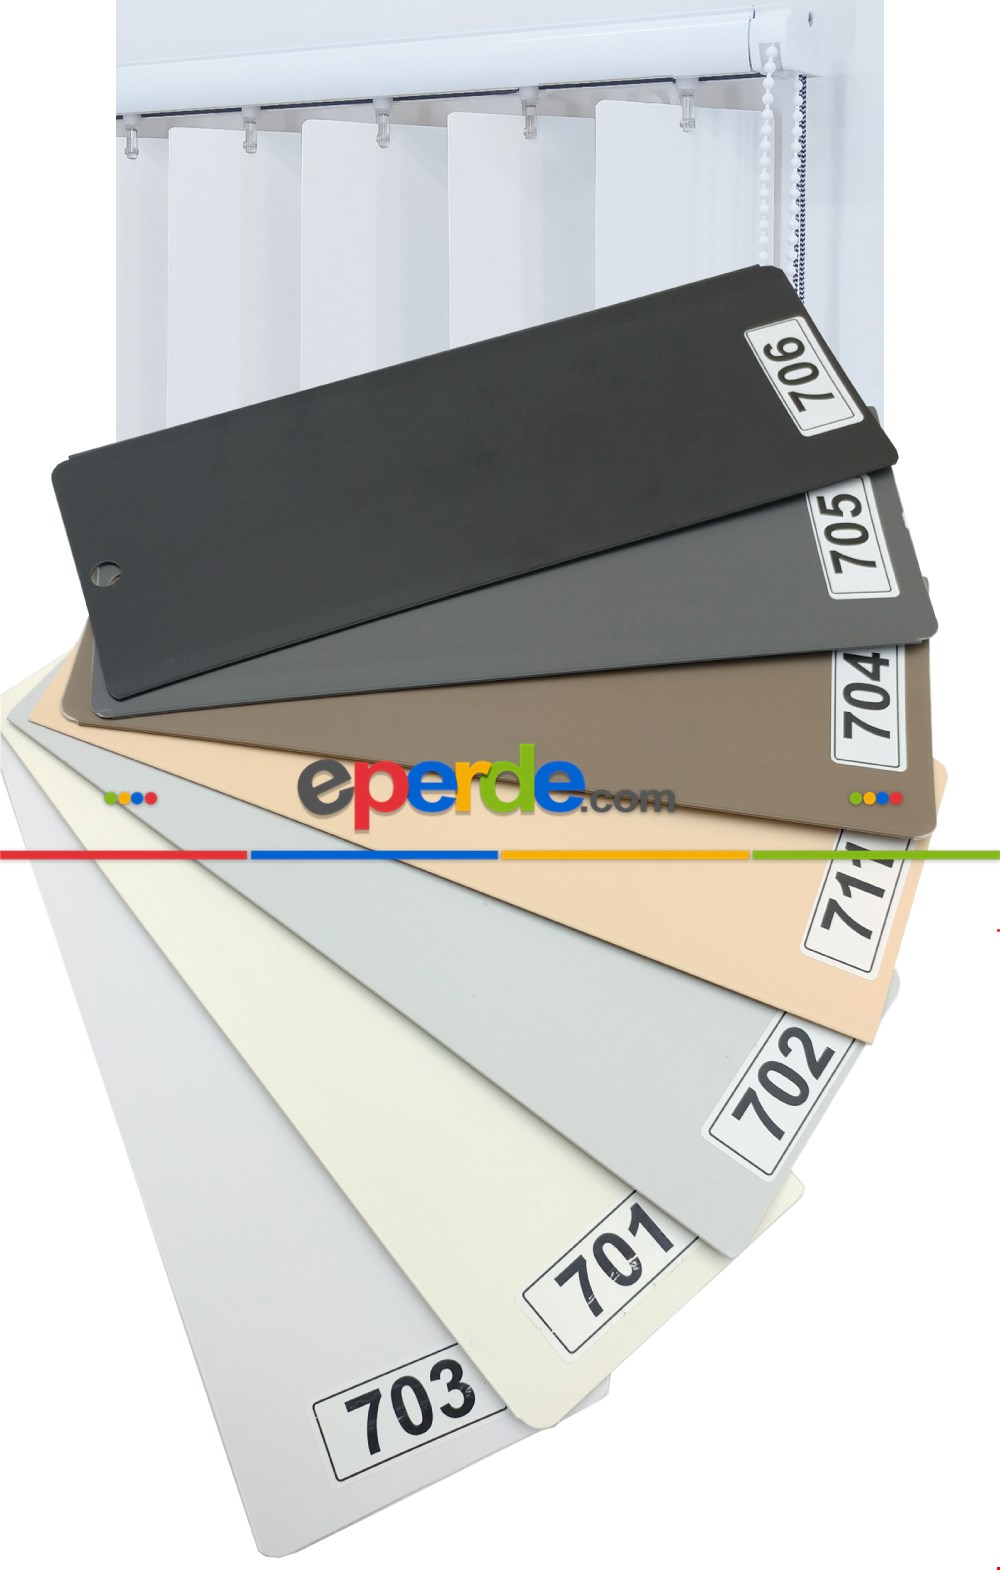 1. Kalite 7 Renk Pvc Dikey Perde - Ofis Fabrika İşyeri Perdesi